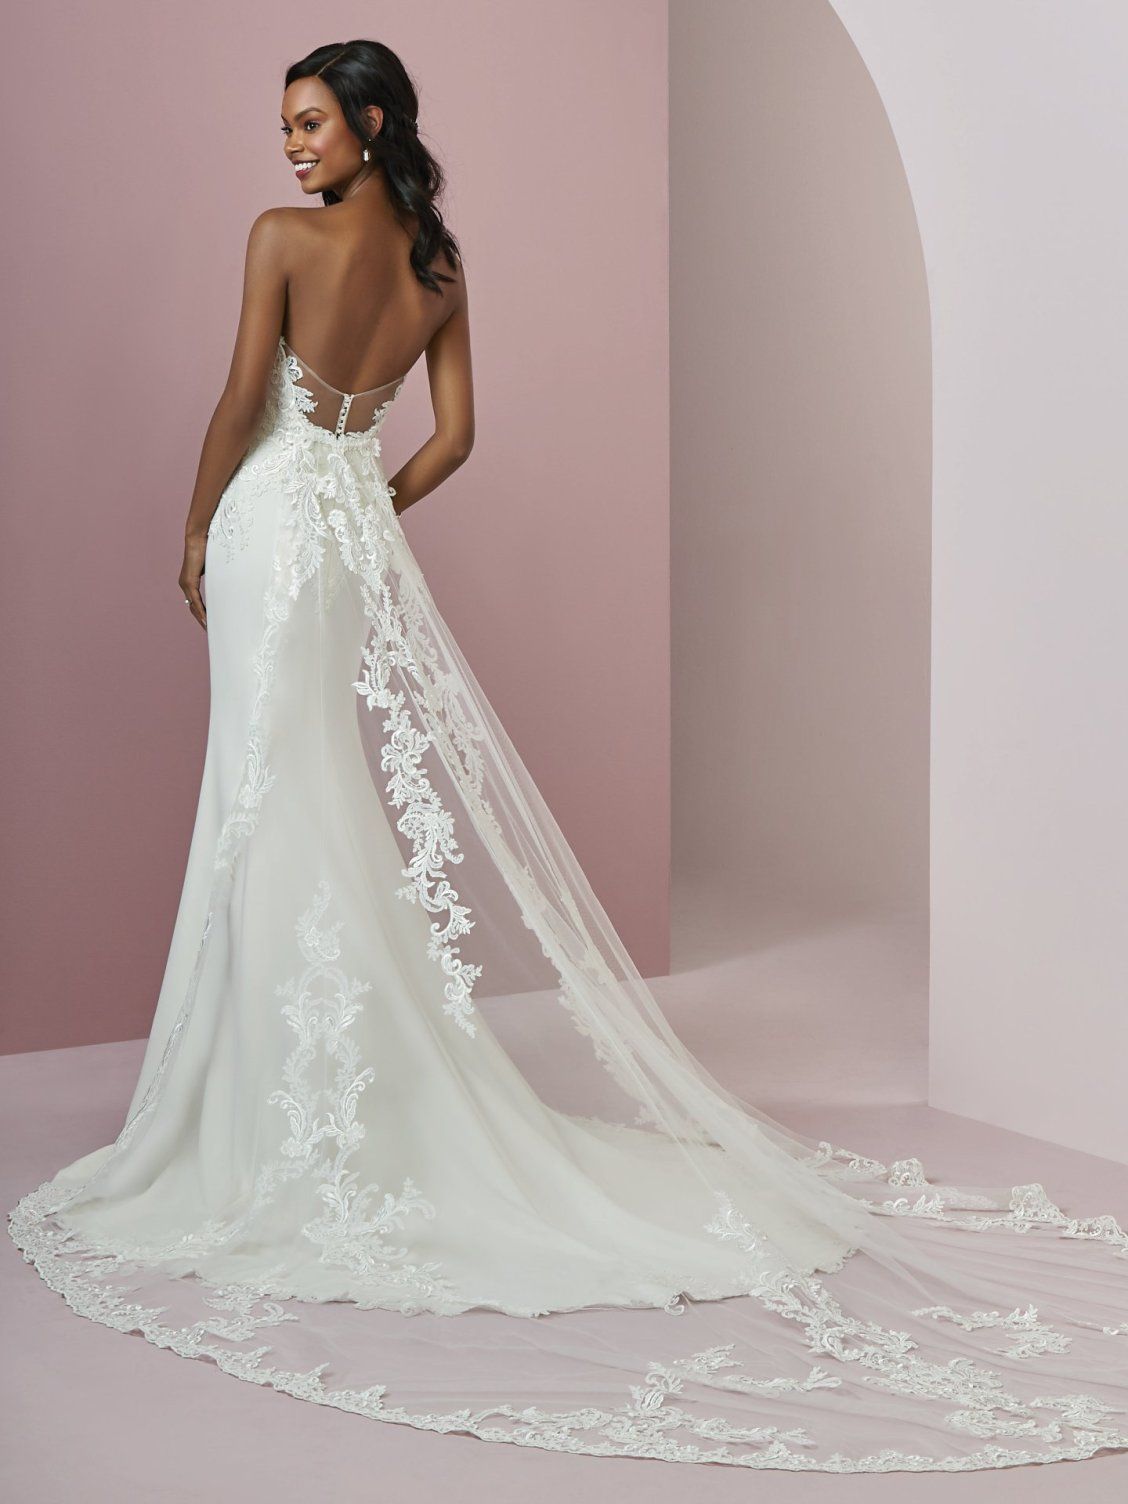 Adaptable New 2019 Sheath Wedding Dress Long Sleeve Soft Satin Backless Women Beach Country Wedding Gowns Reception Bride Dresses Weddings & Events